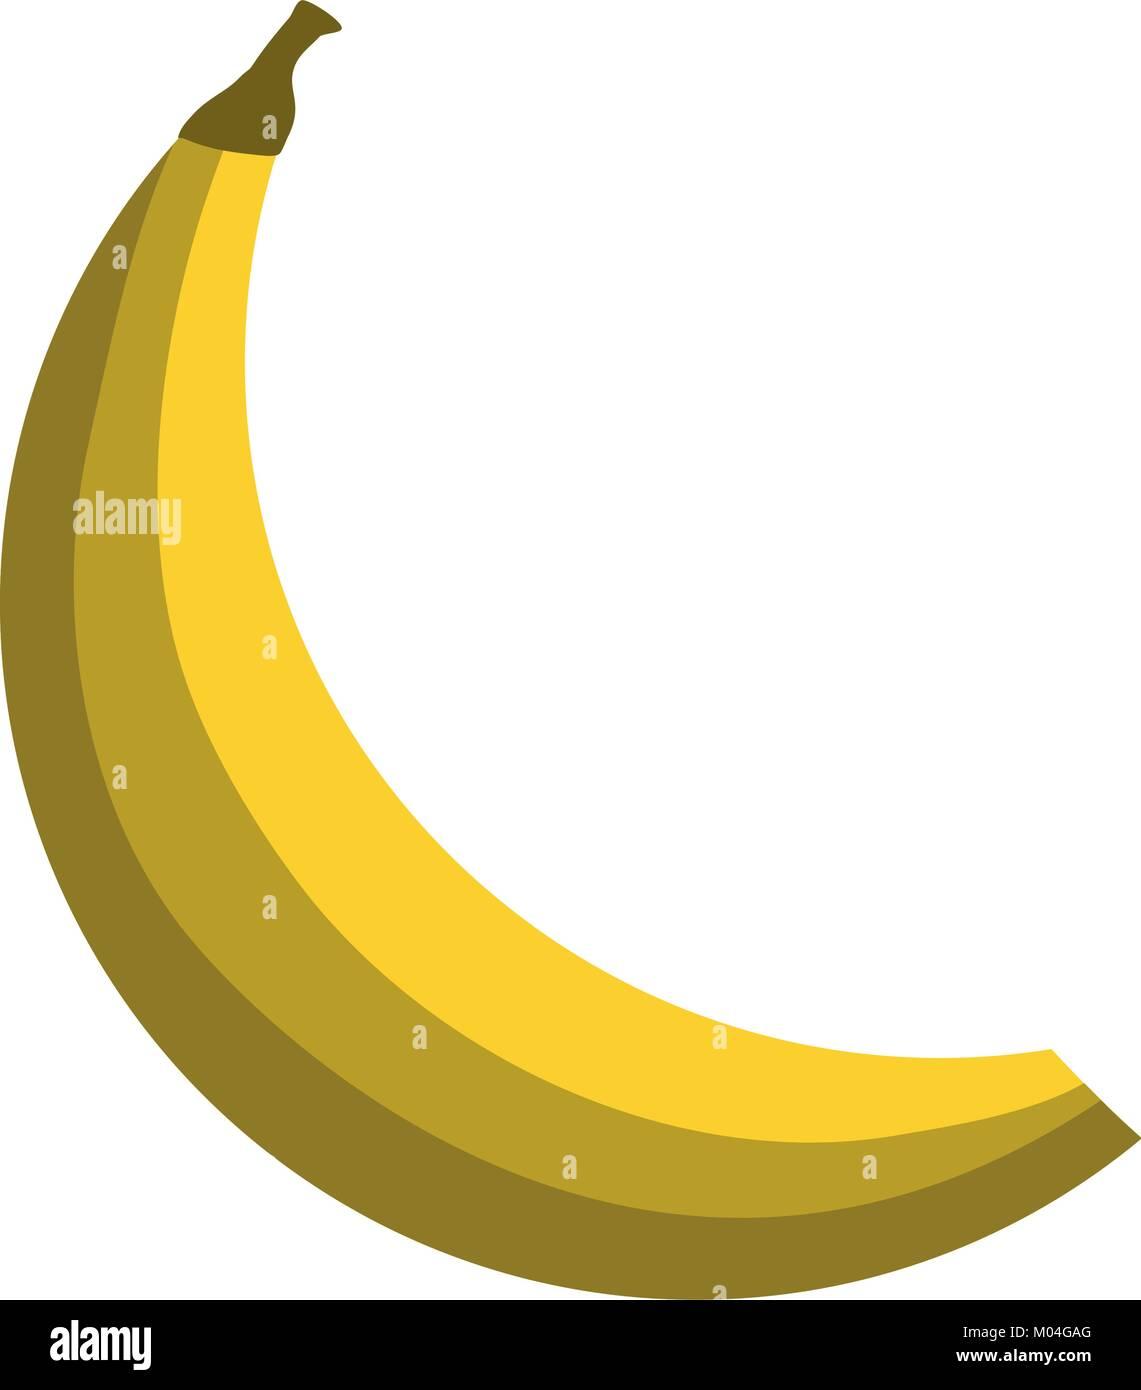 healhty fruits design - Stock Image